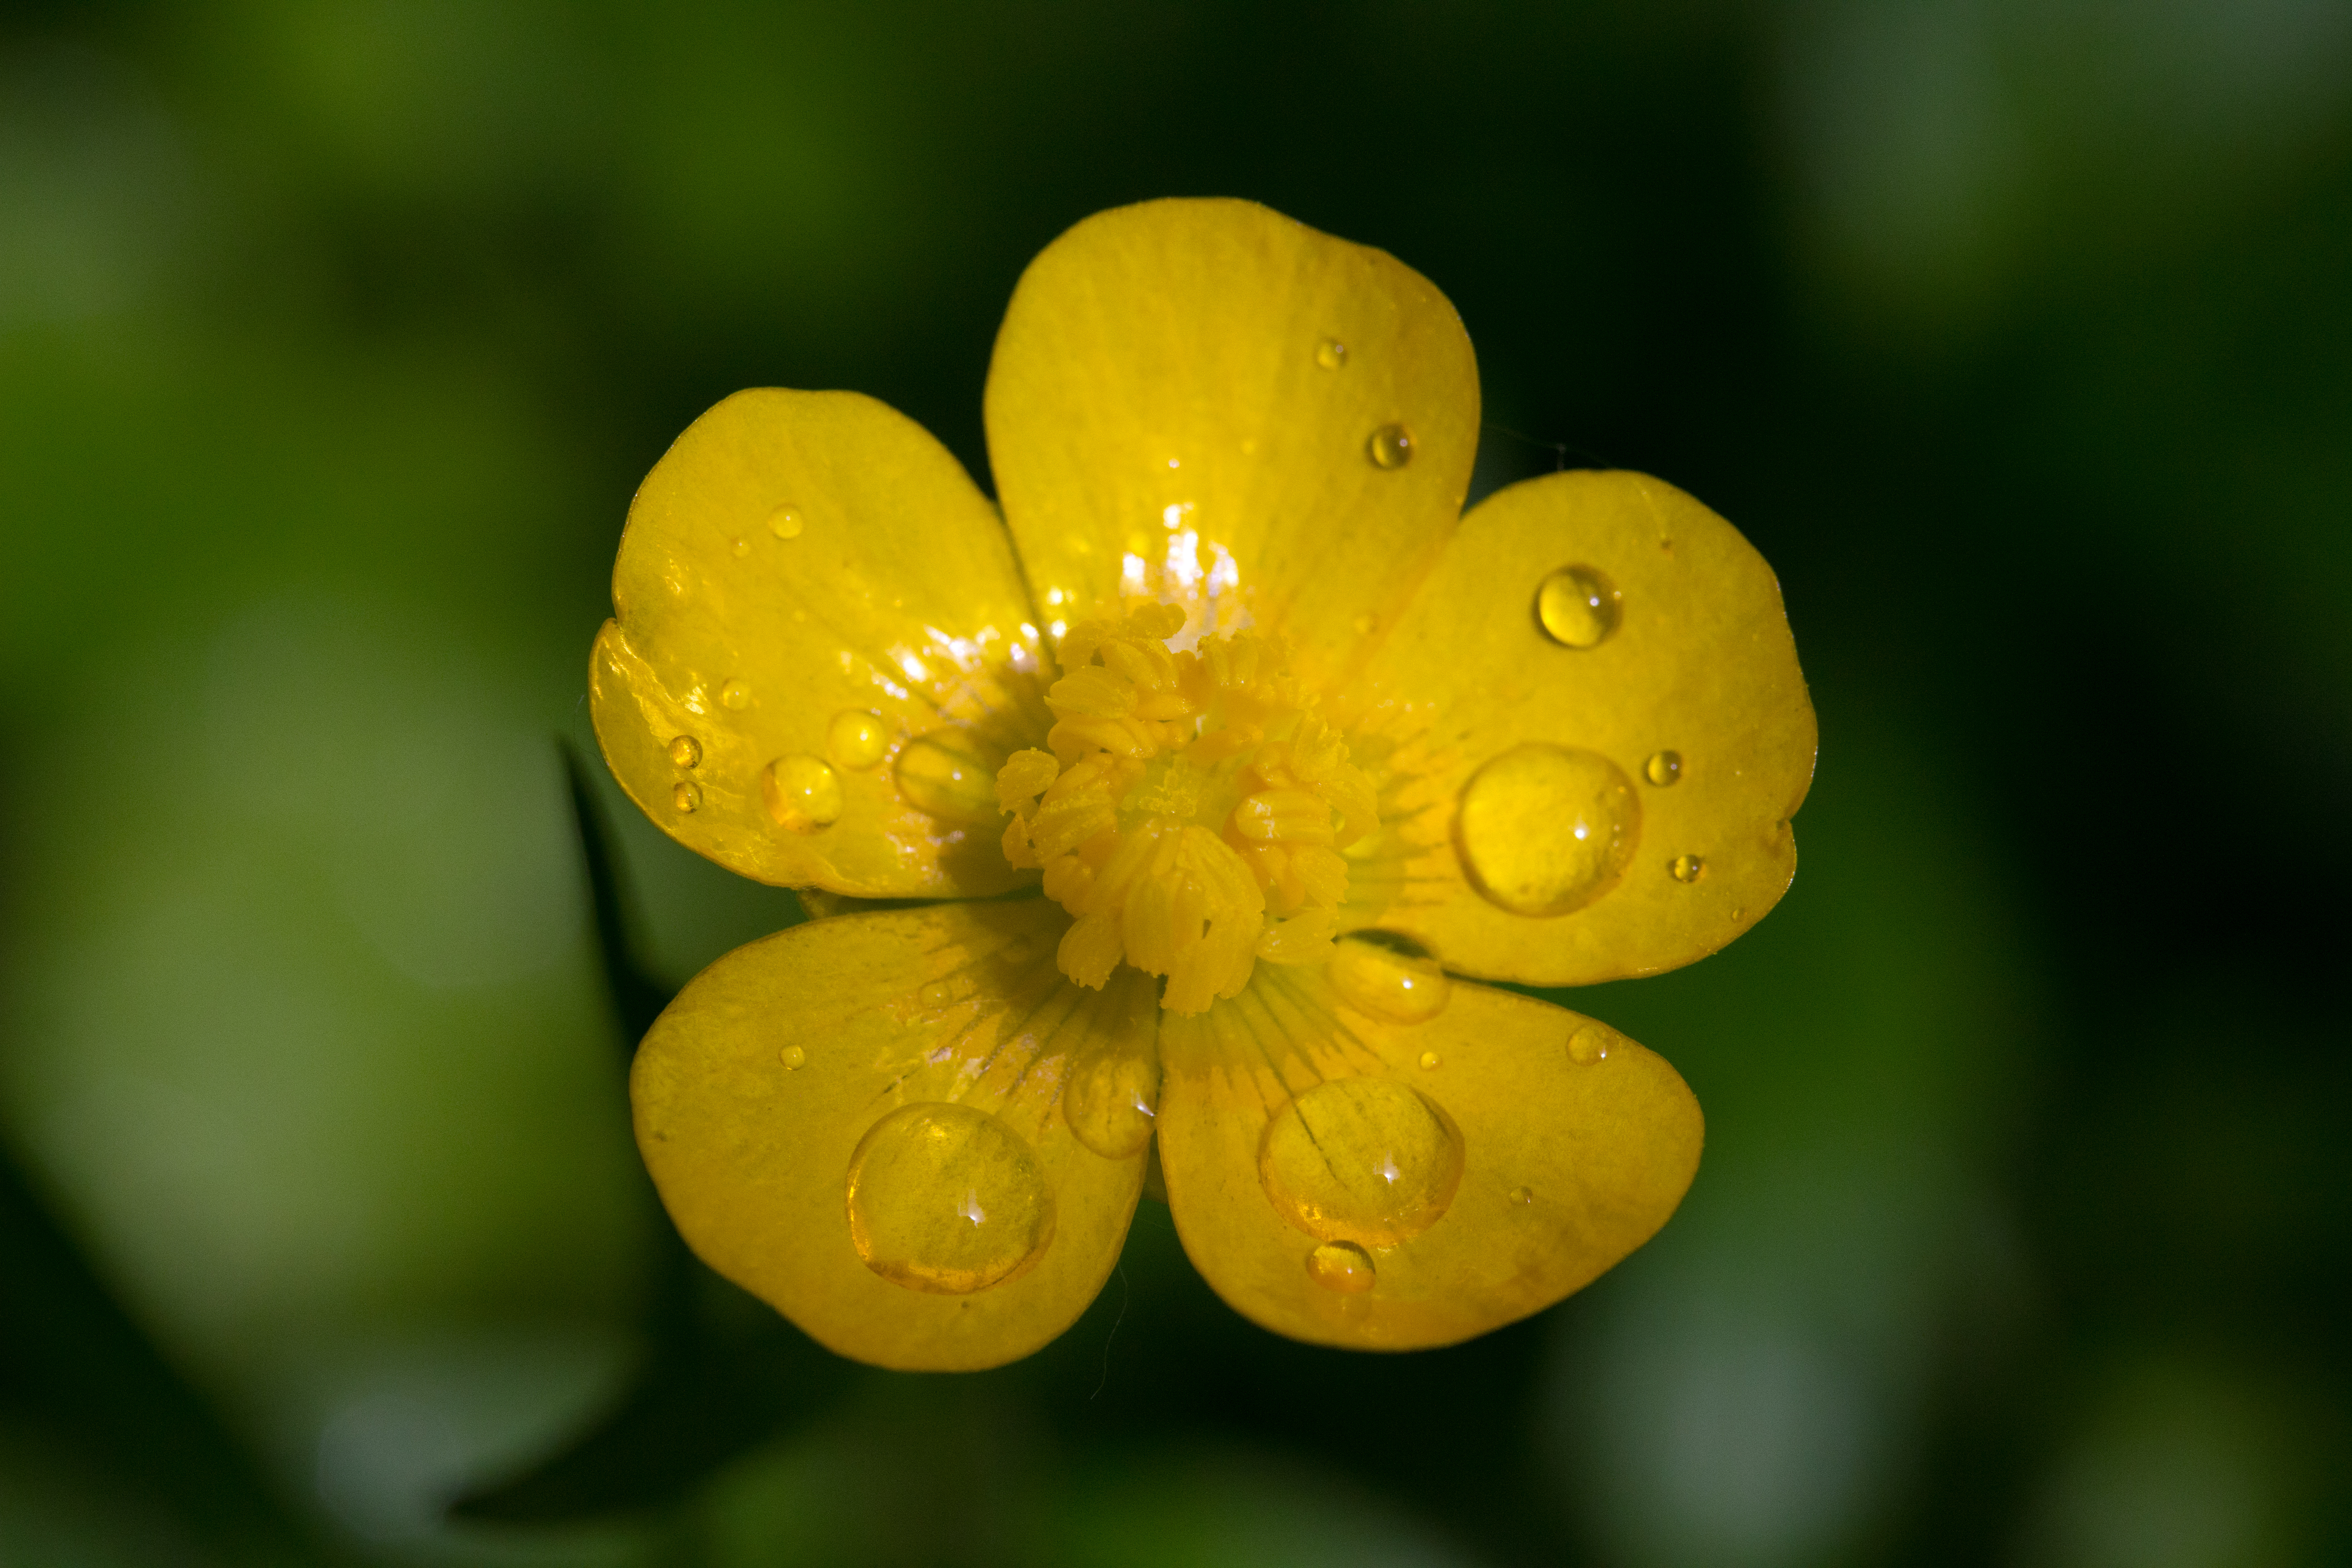 https://upload.wikimedia.org/wikipedia/commons/8/8d/Ranunculus_macro.jpg